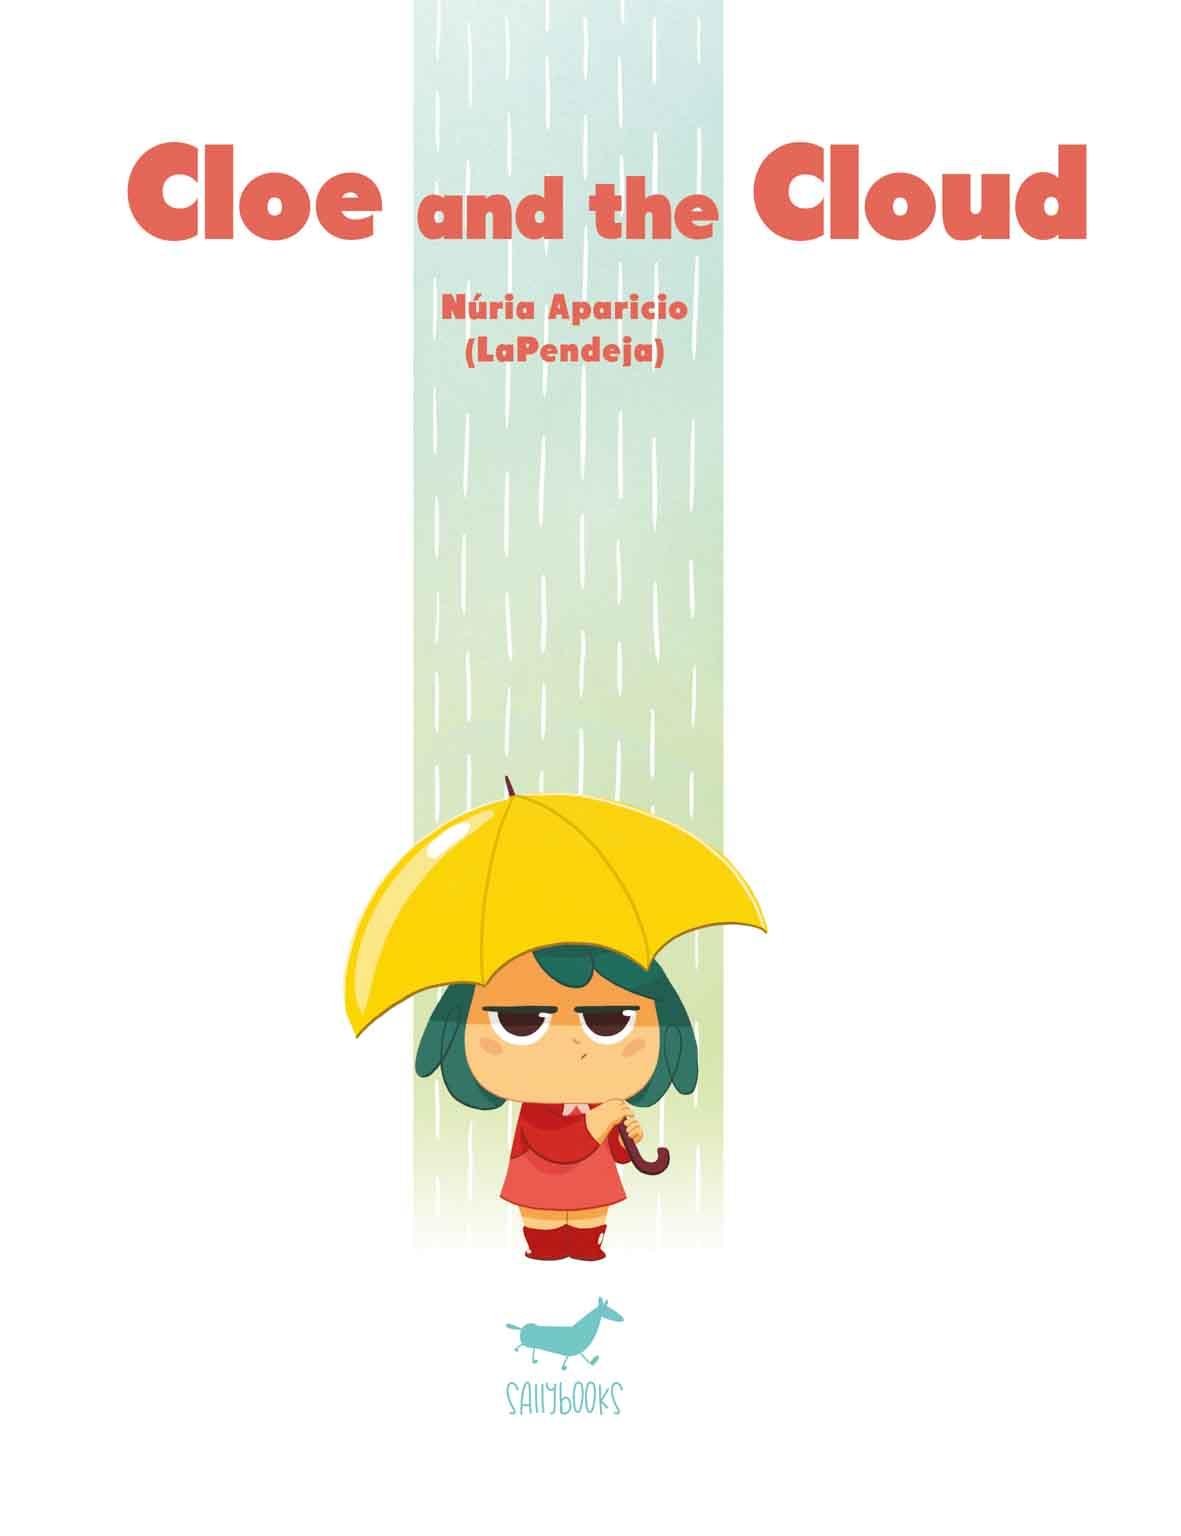 CLOE AND THE CLOUD